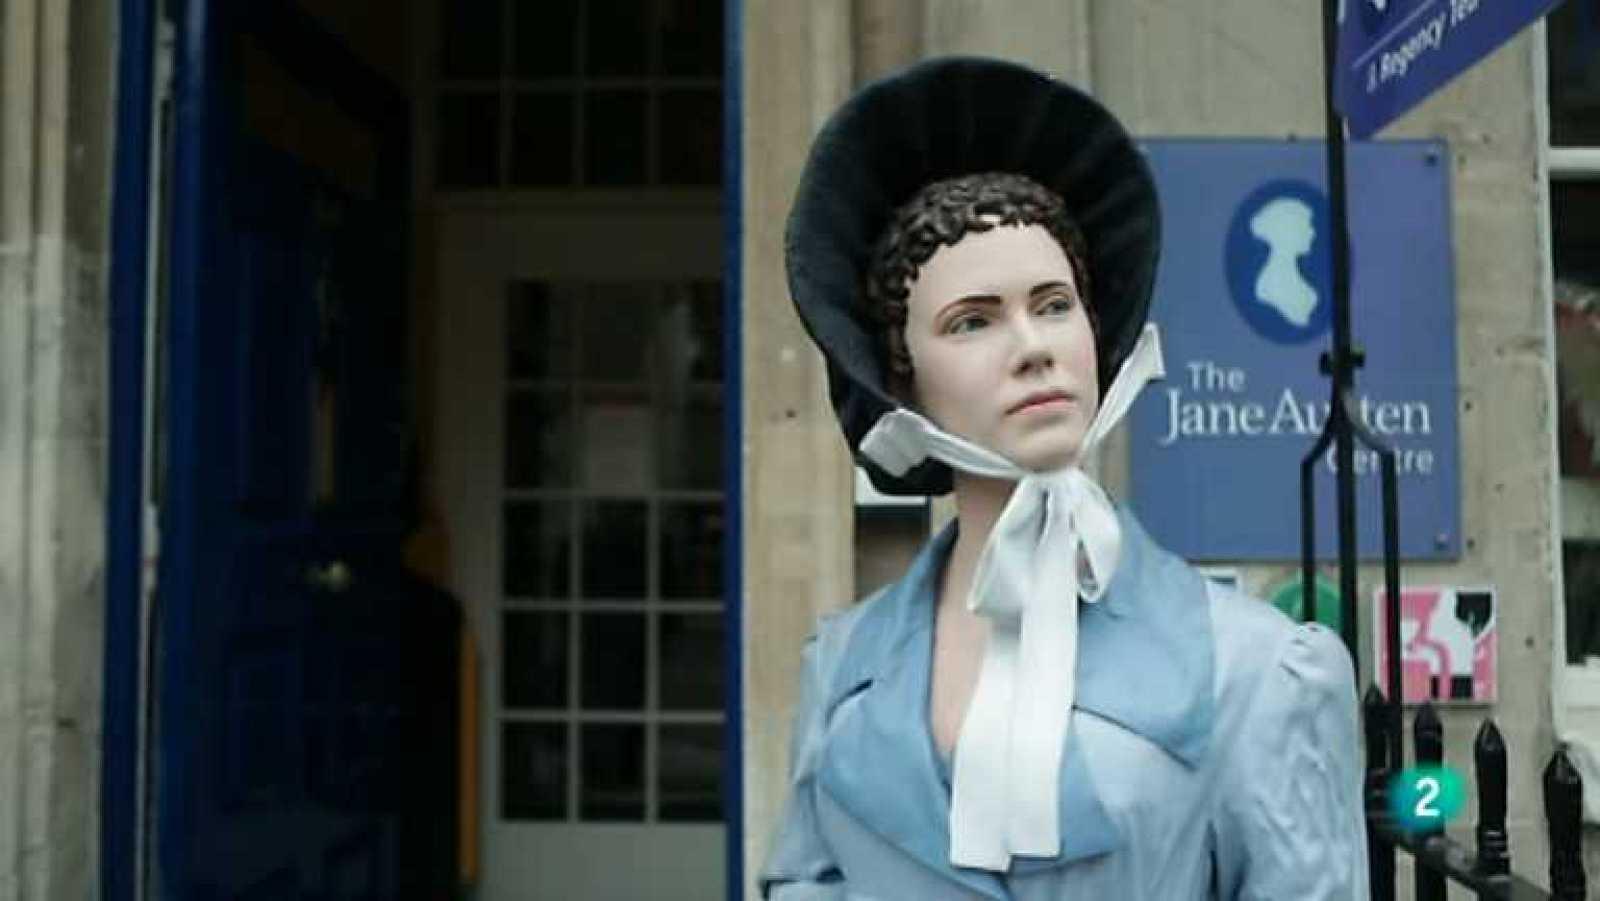 Página 2 - Jane Austen - ver ahora